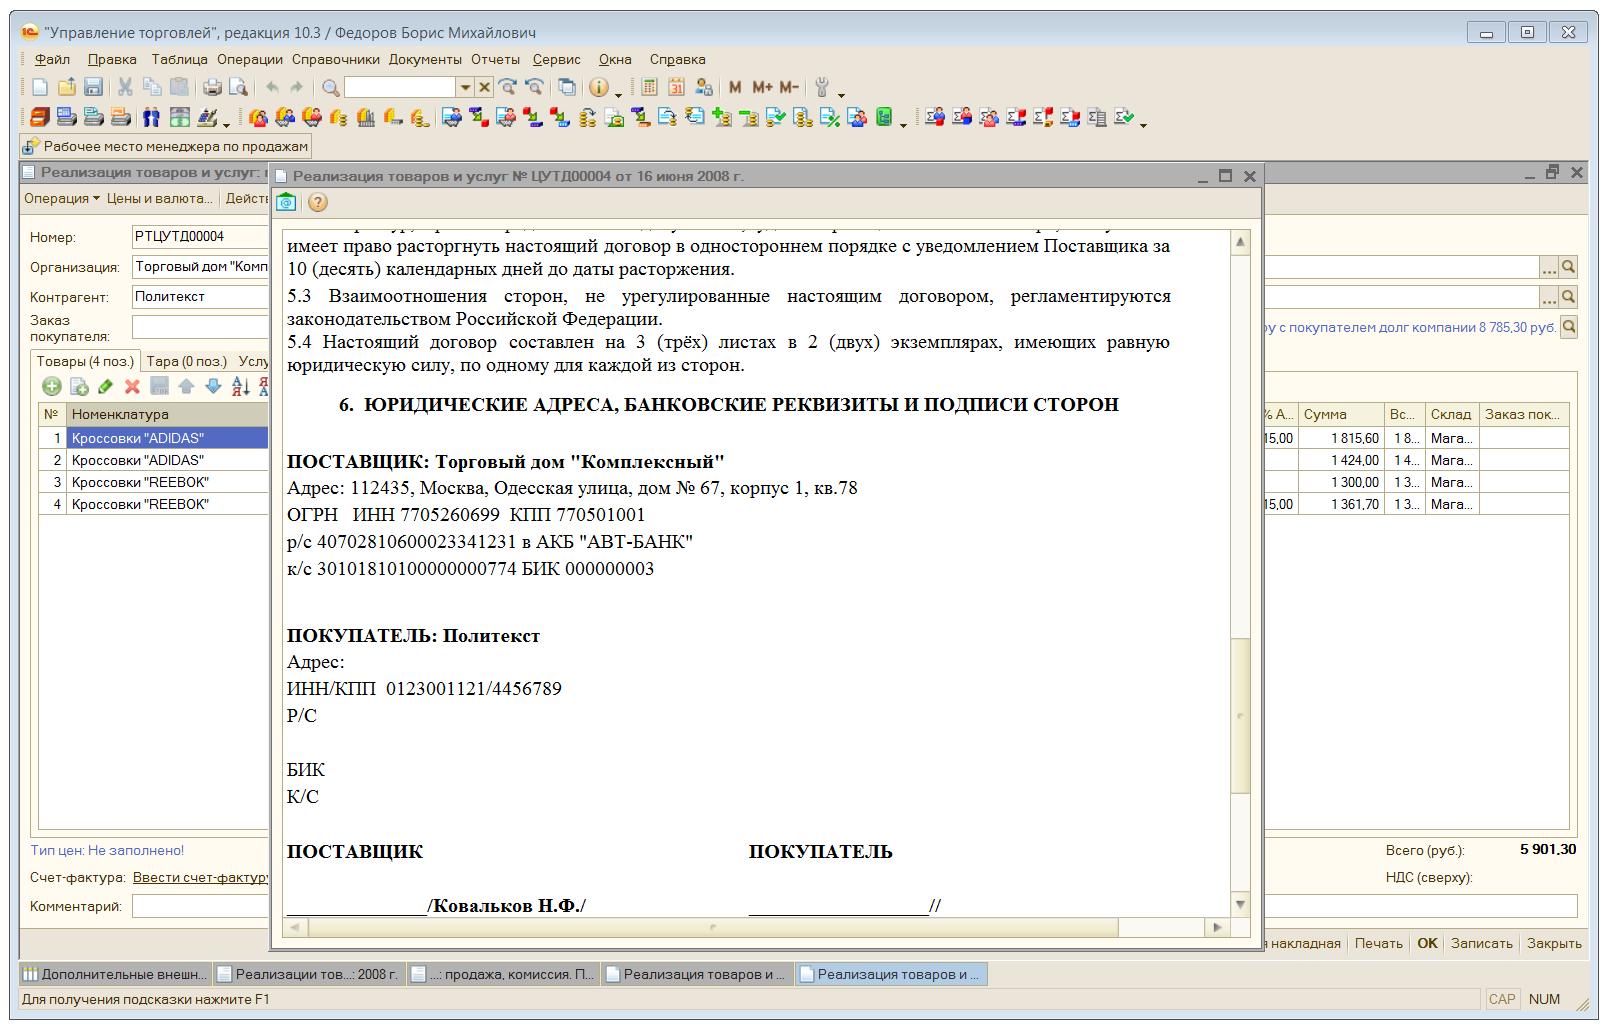 Договор и Спецификация 1С РТУ УТ 10.3 (рис.2) | tekdata.ru